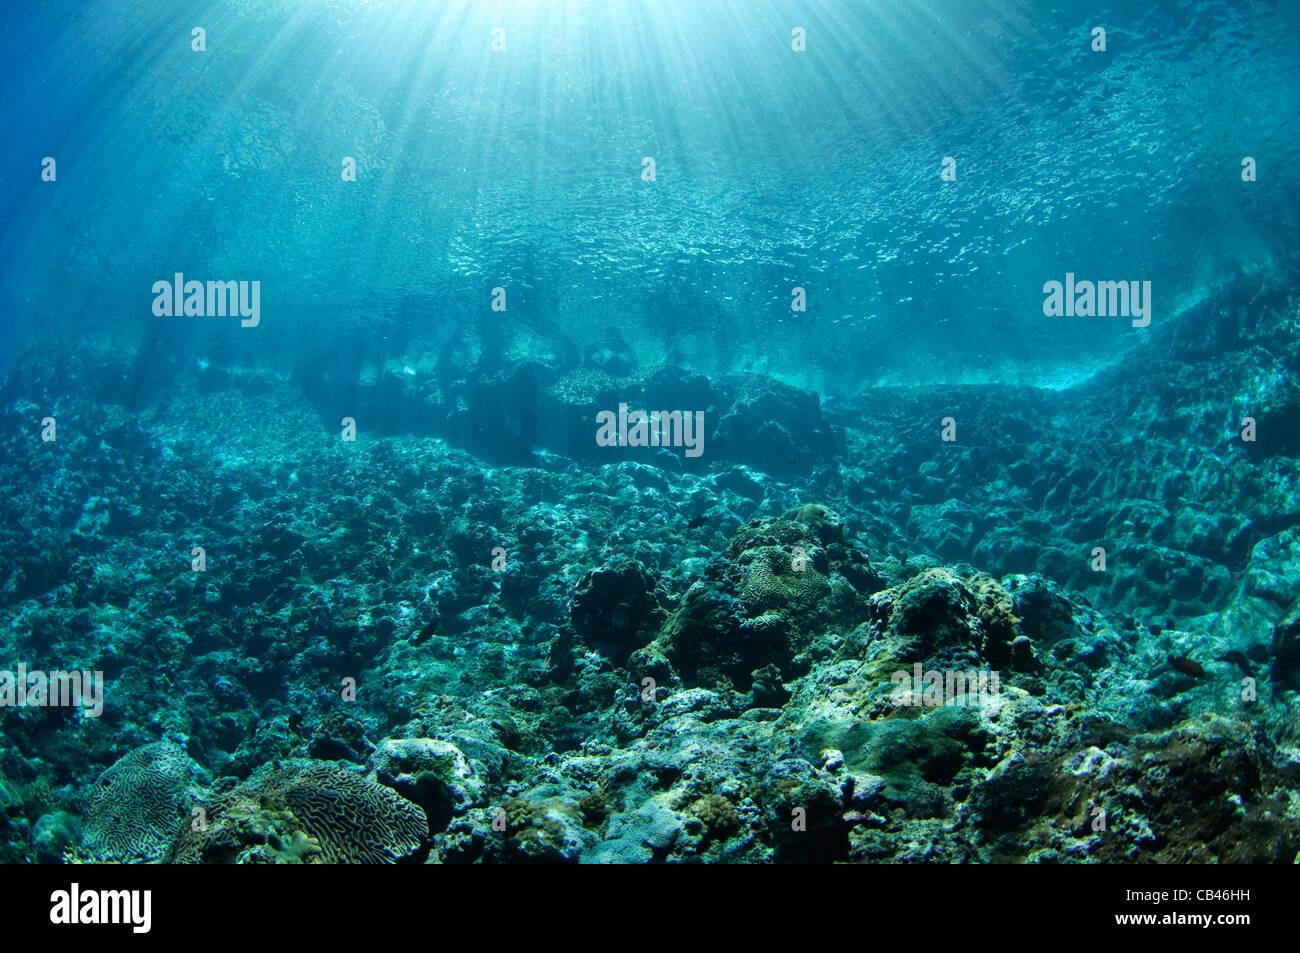 Sunrays or Gods rays slicing through crystal clear water, Gunung Api island, Banda Sea, Eastern Indonesia, Pacific - Stock Image